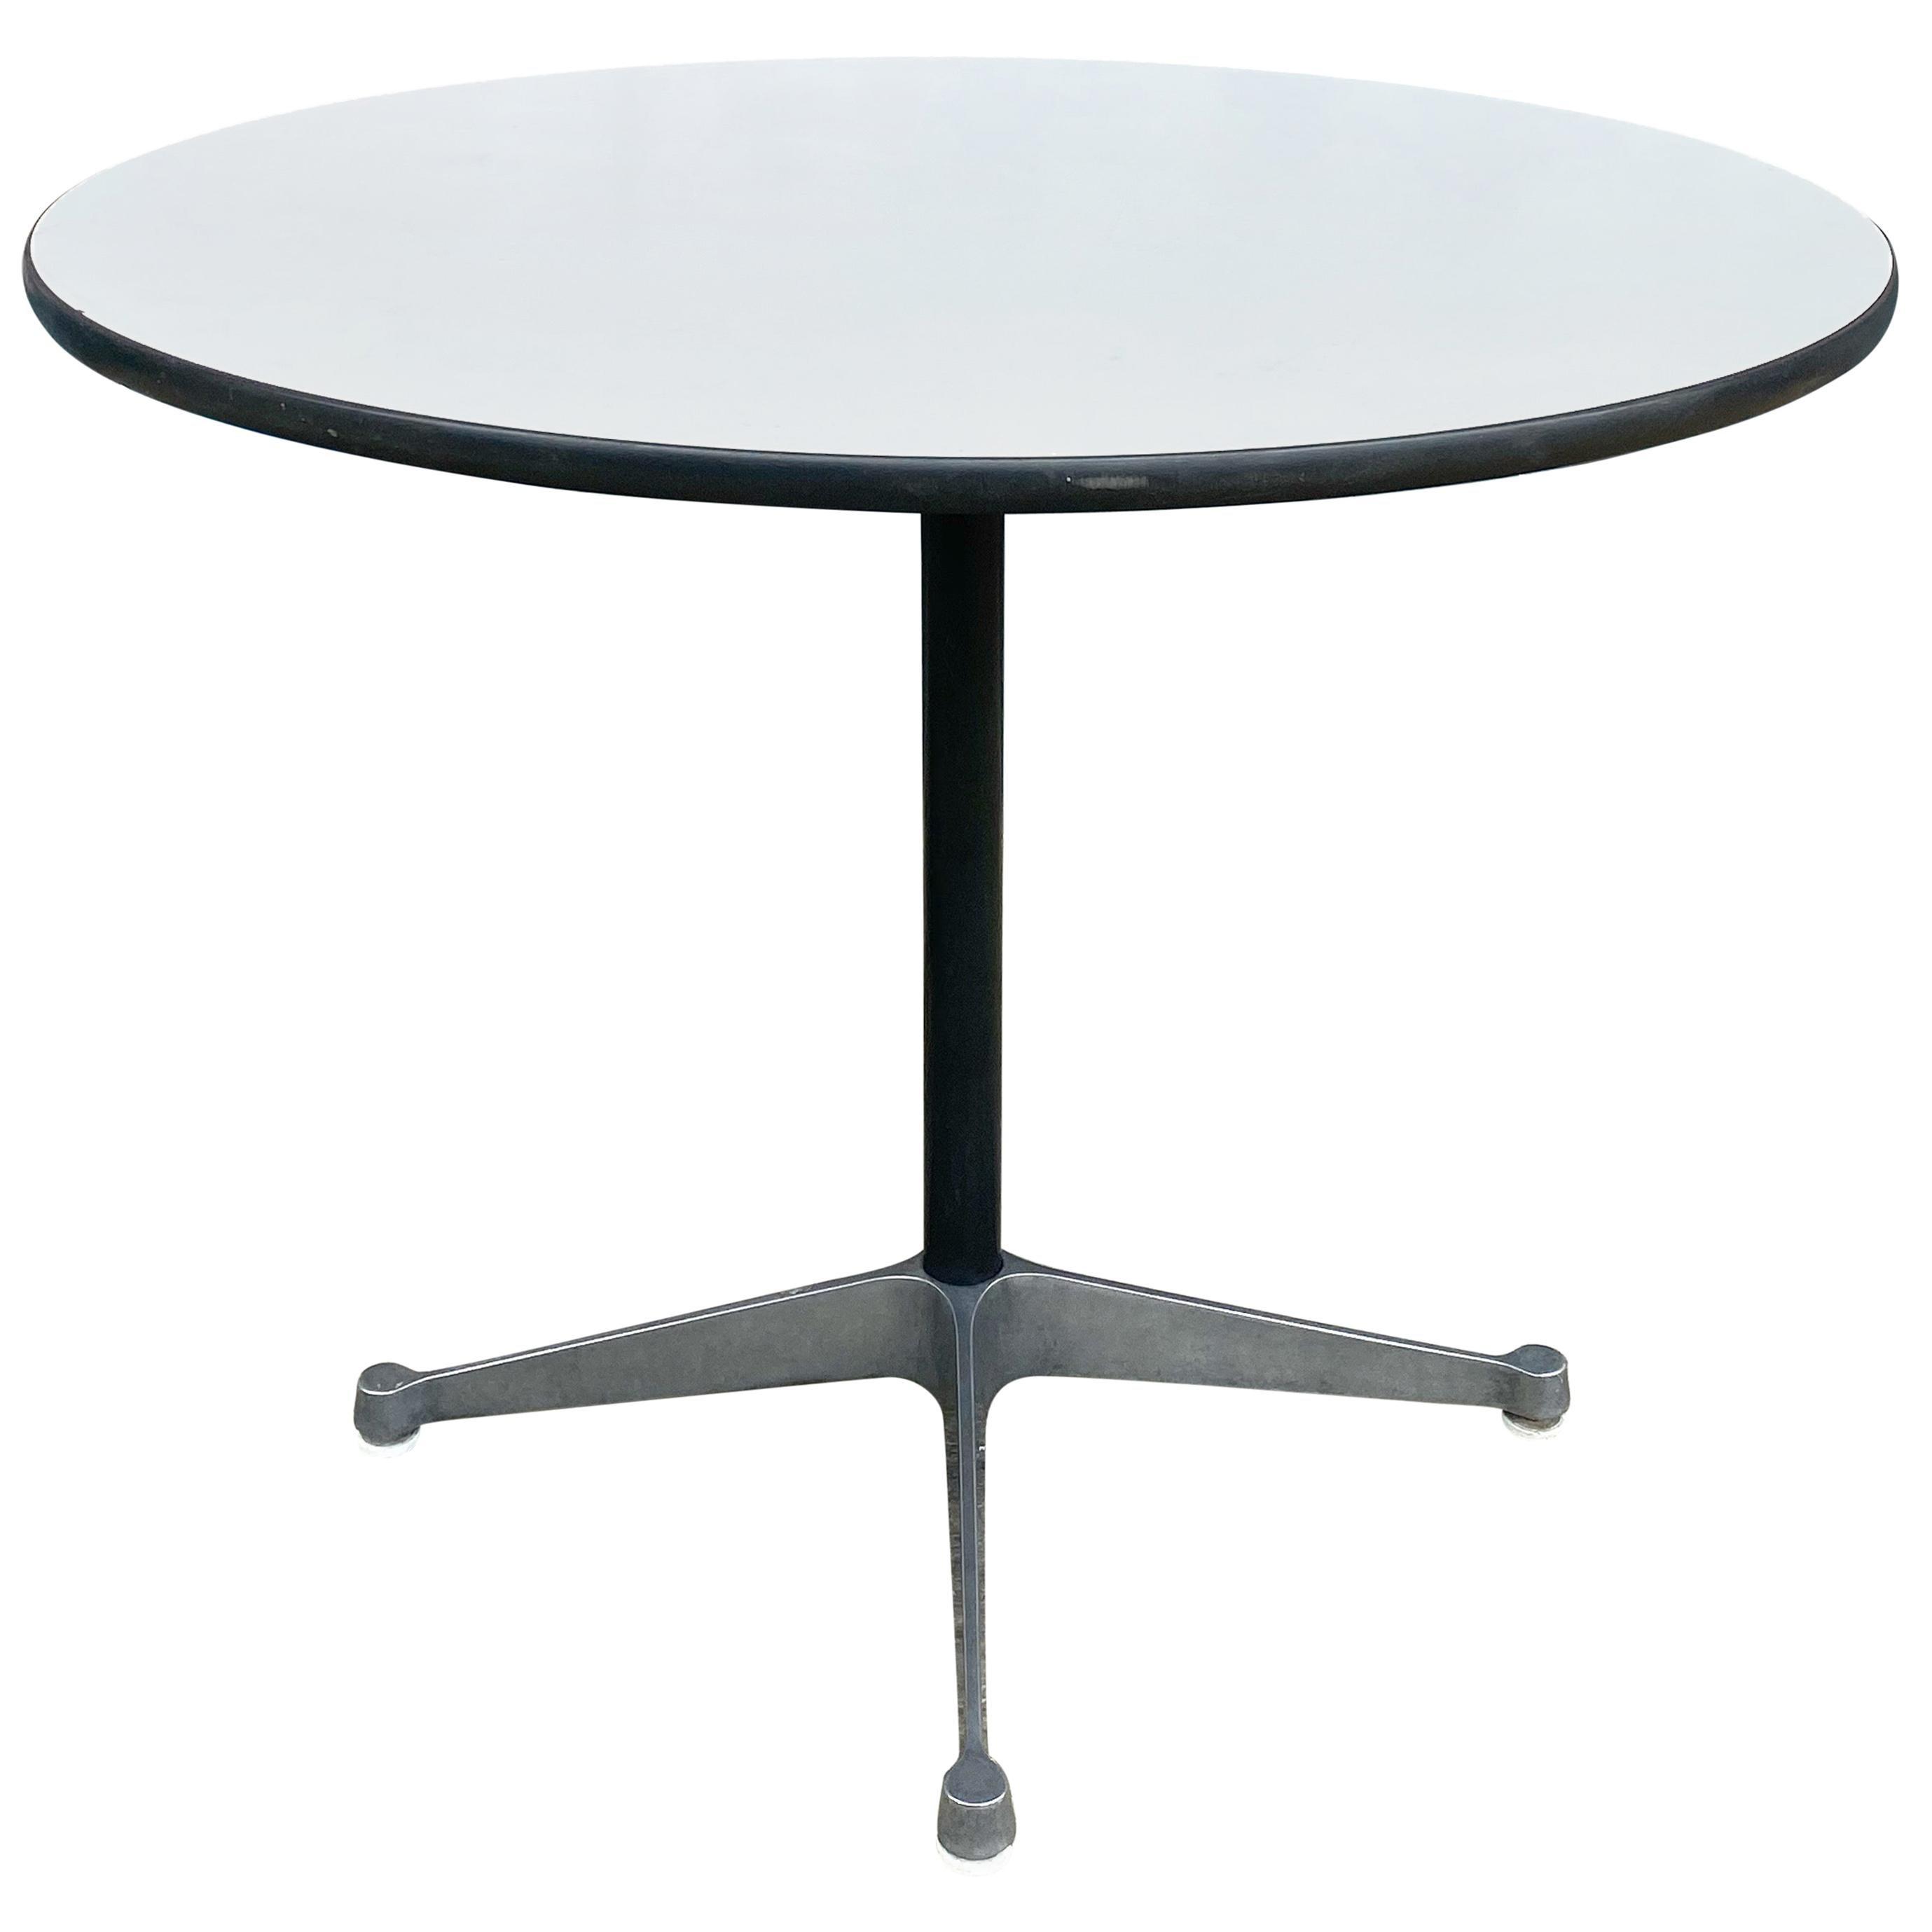 Herman Miller Eames Dining Table